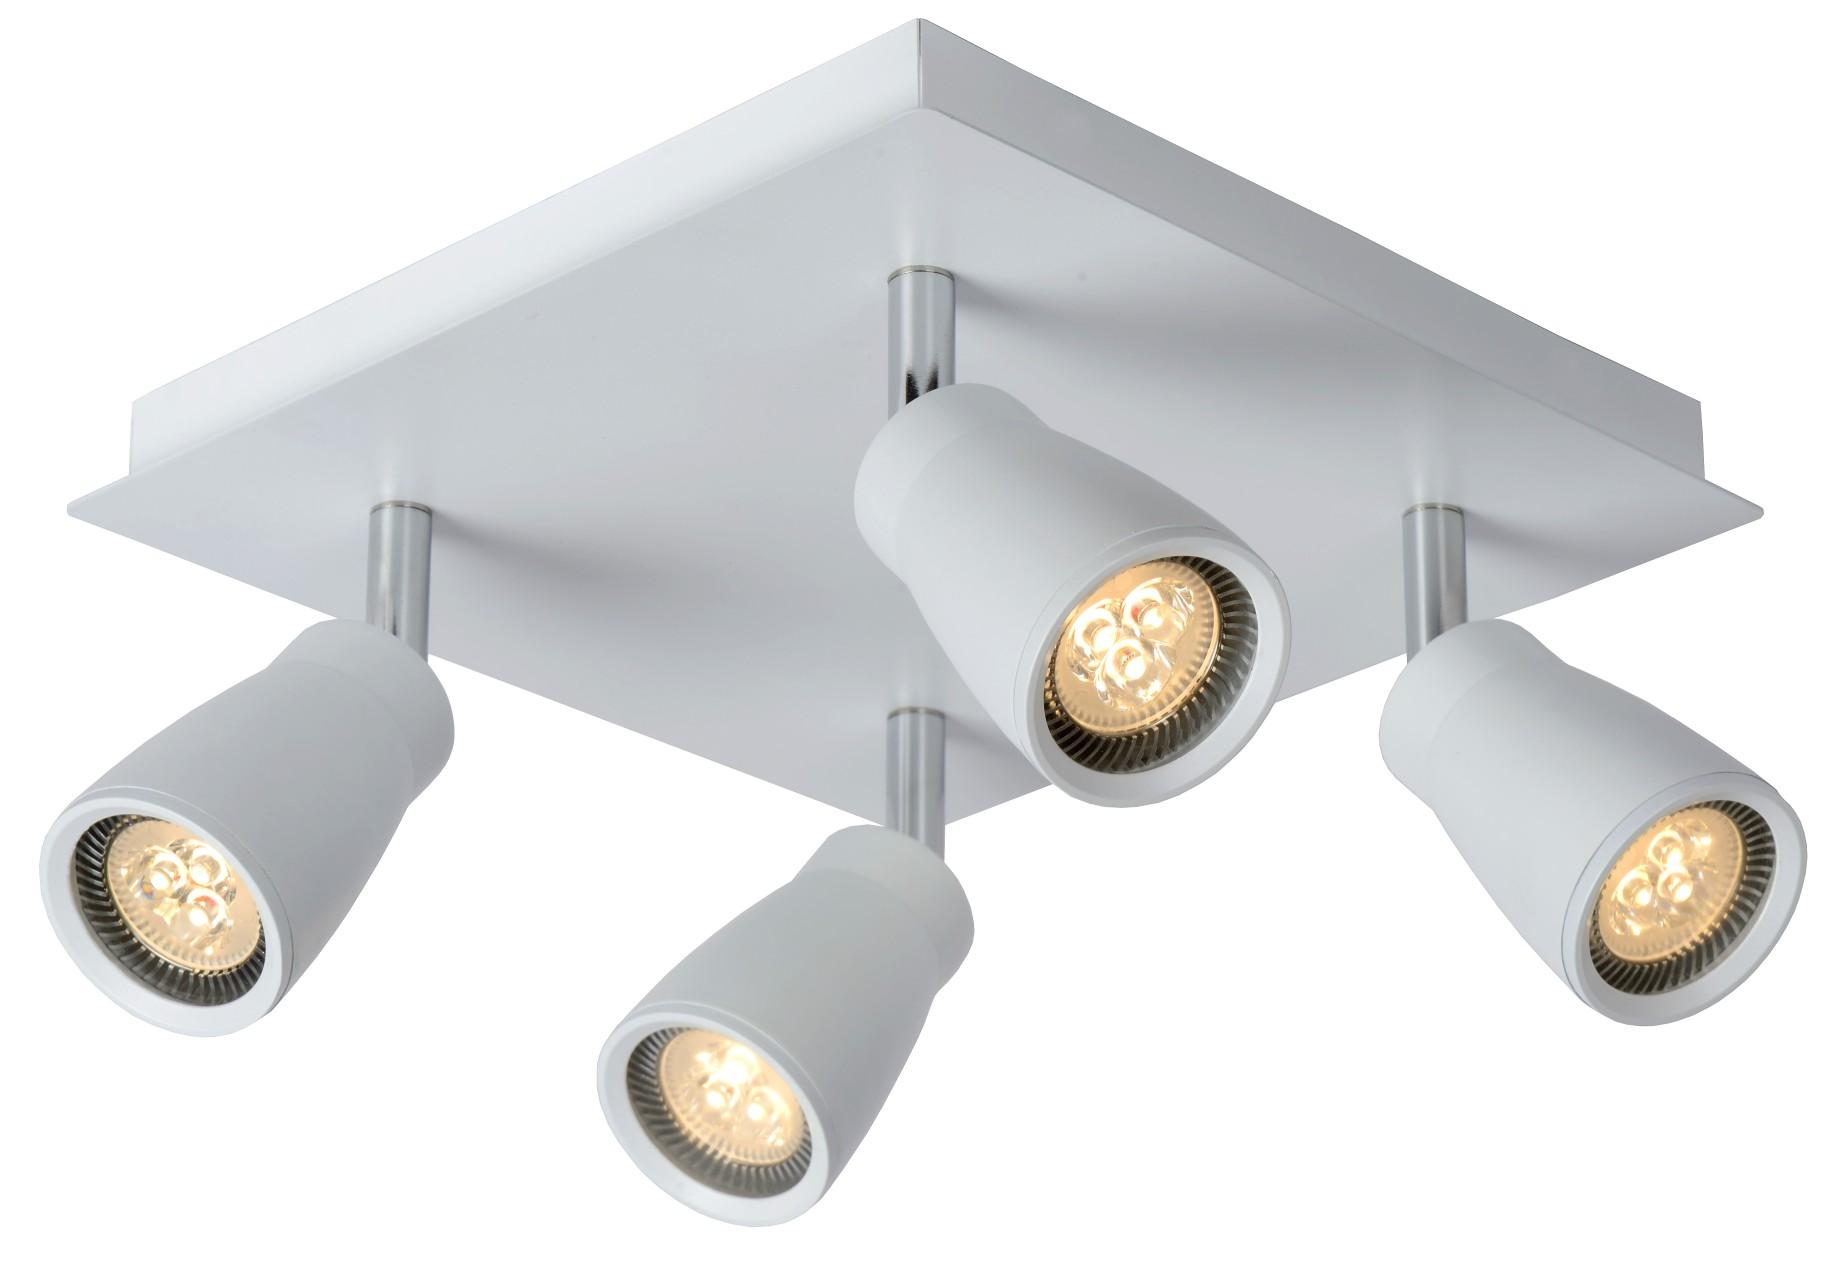 lucide plafondspot zett 4 dimbare led wit in de aanbieding. Black Bedroom Furniture Sets. Home Design Ideas